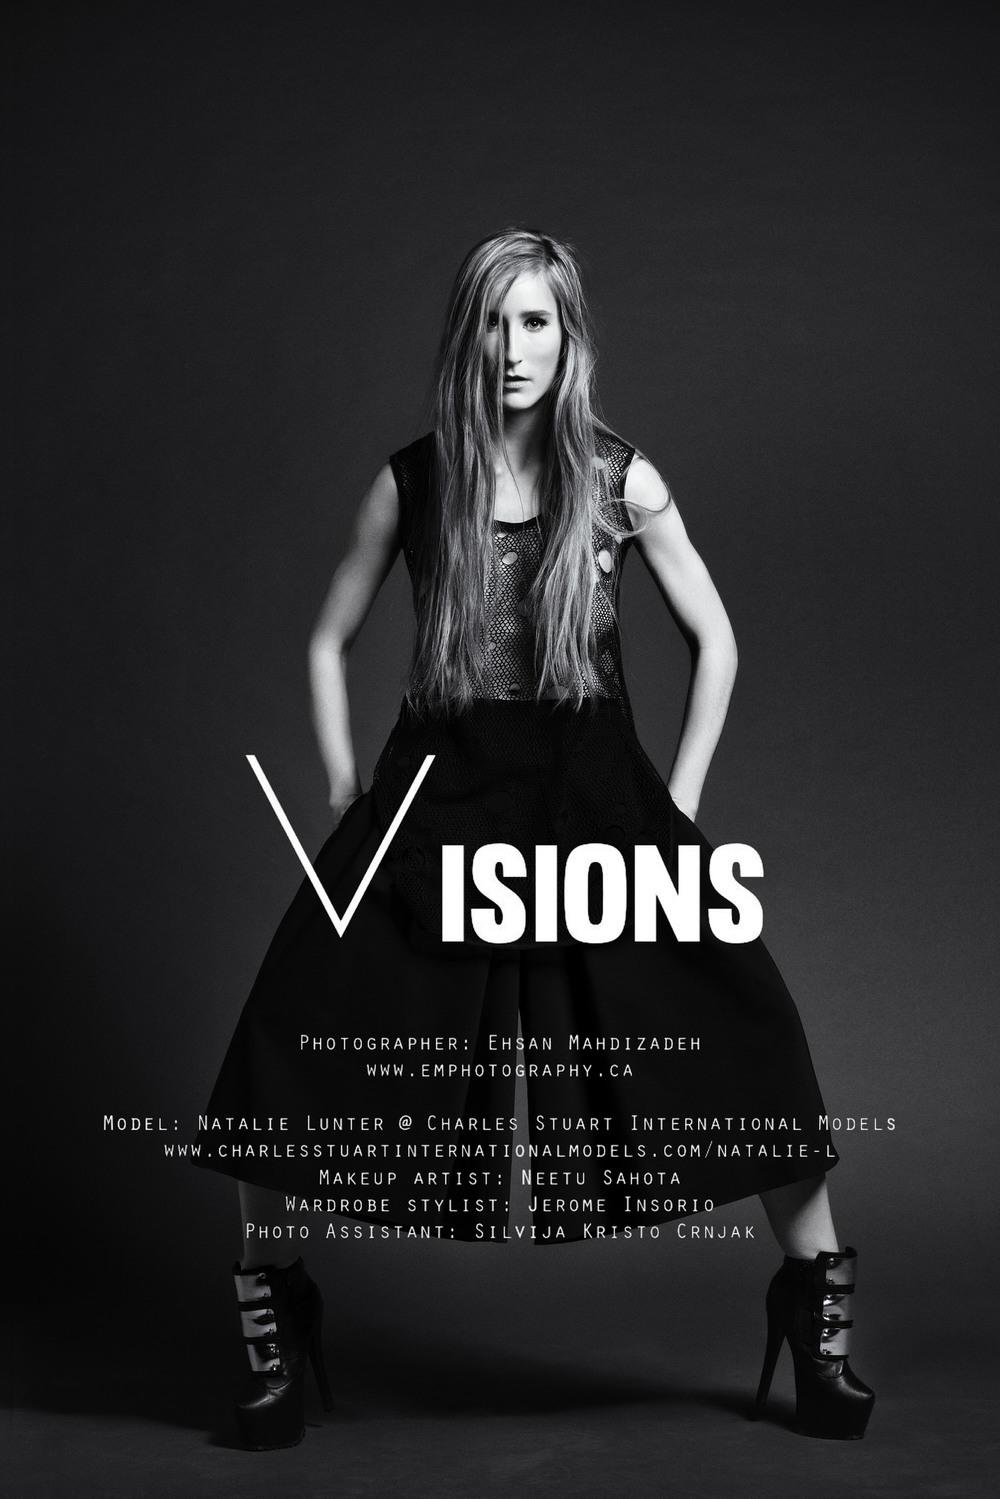 Ehsan-mahdizadeh-fashion-editorial-advertising-photography-13 copy-1.jpg